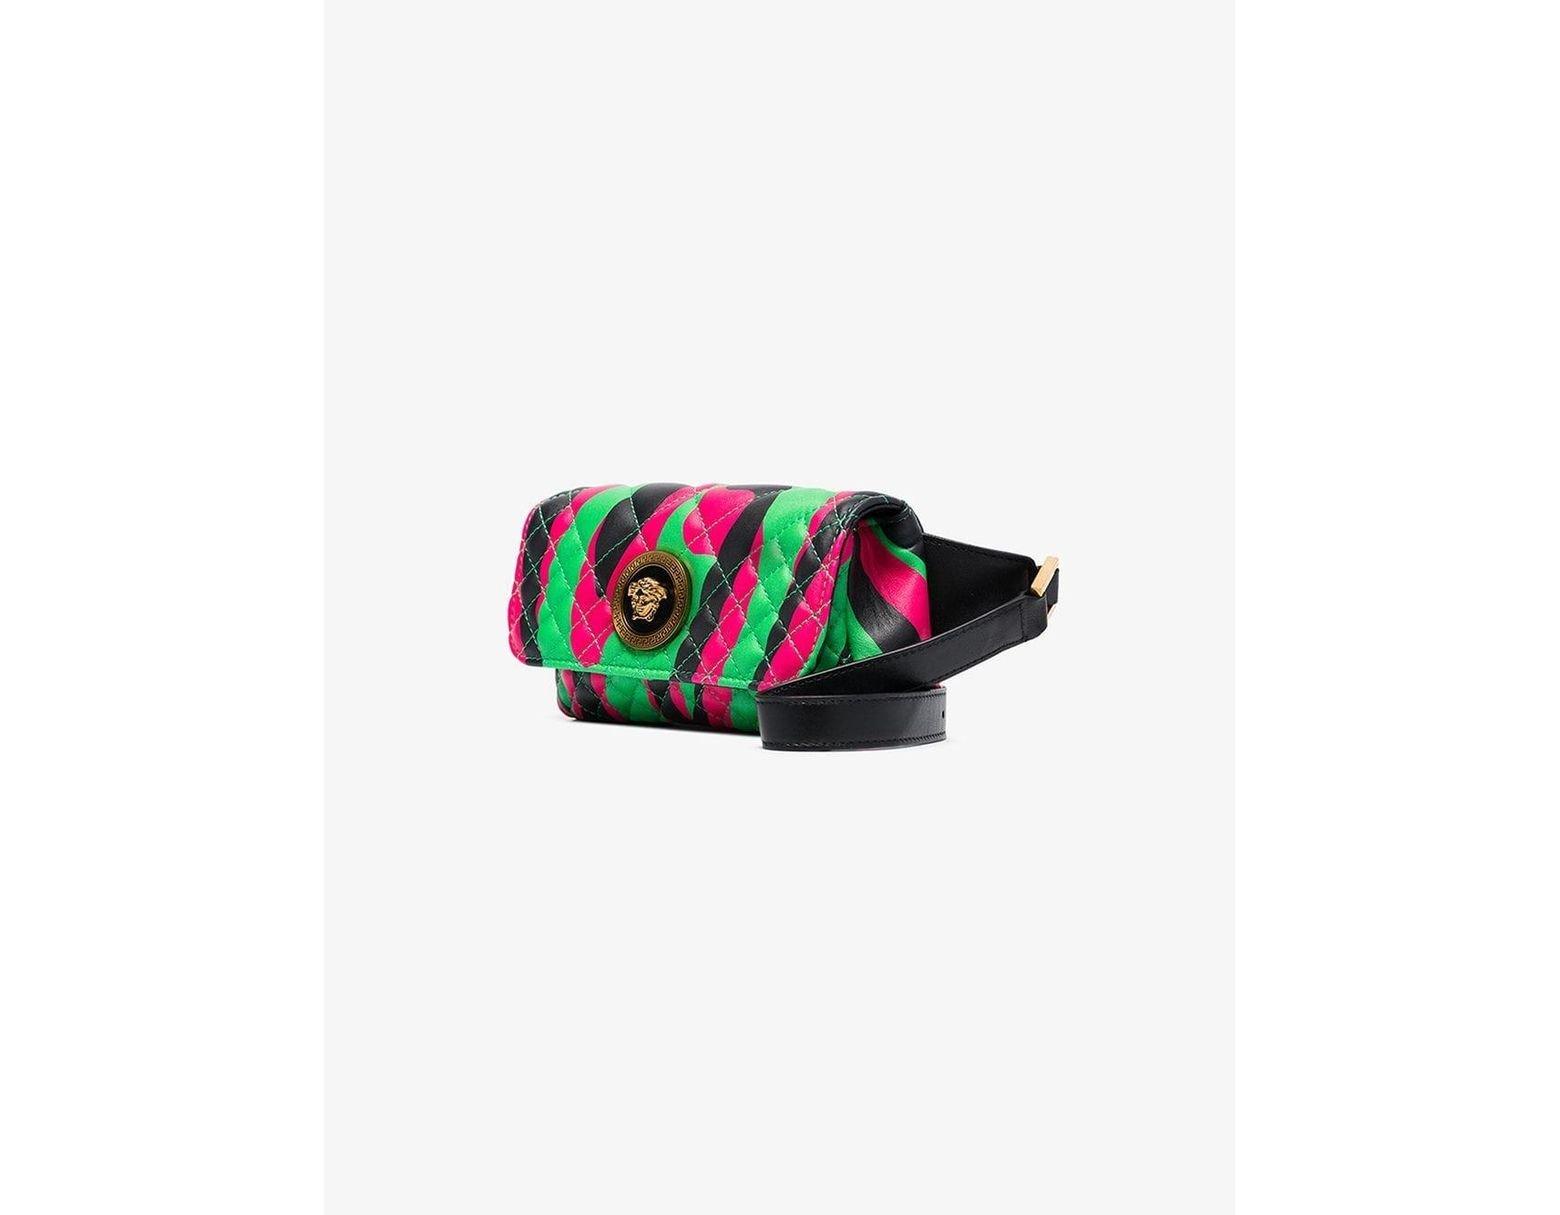 5a464302 Versace Green, Black And Pink Medusa Logo Quilted Leather Belt Bag ...